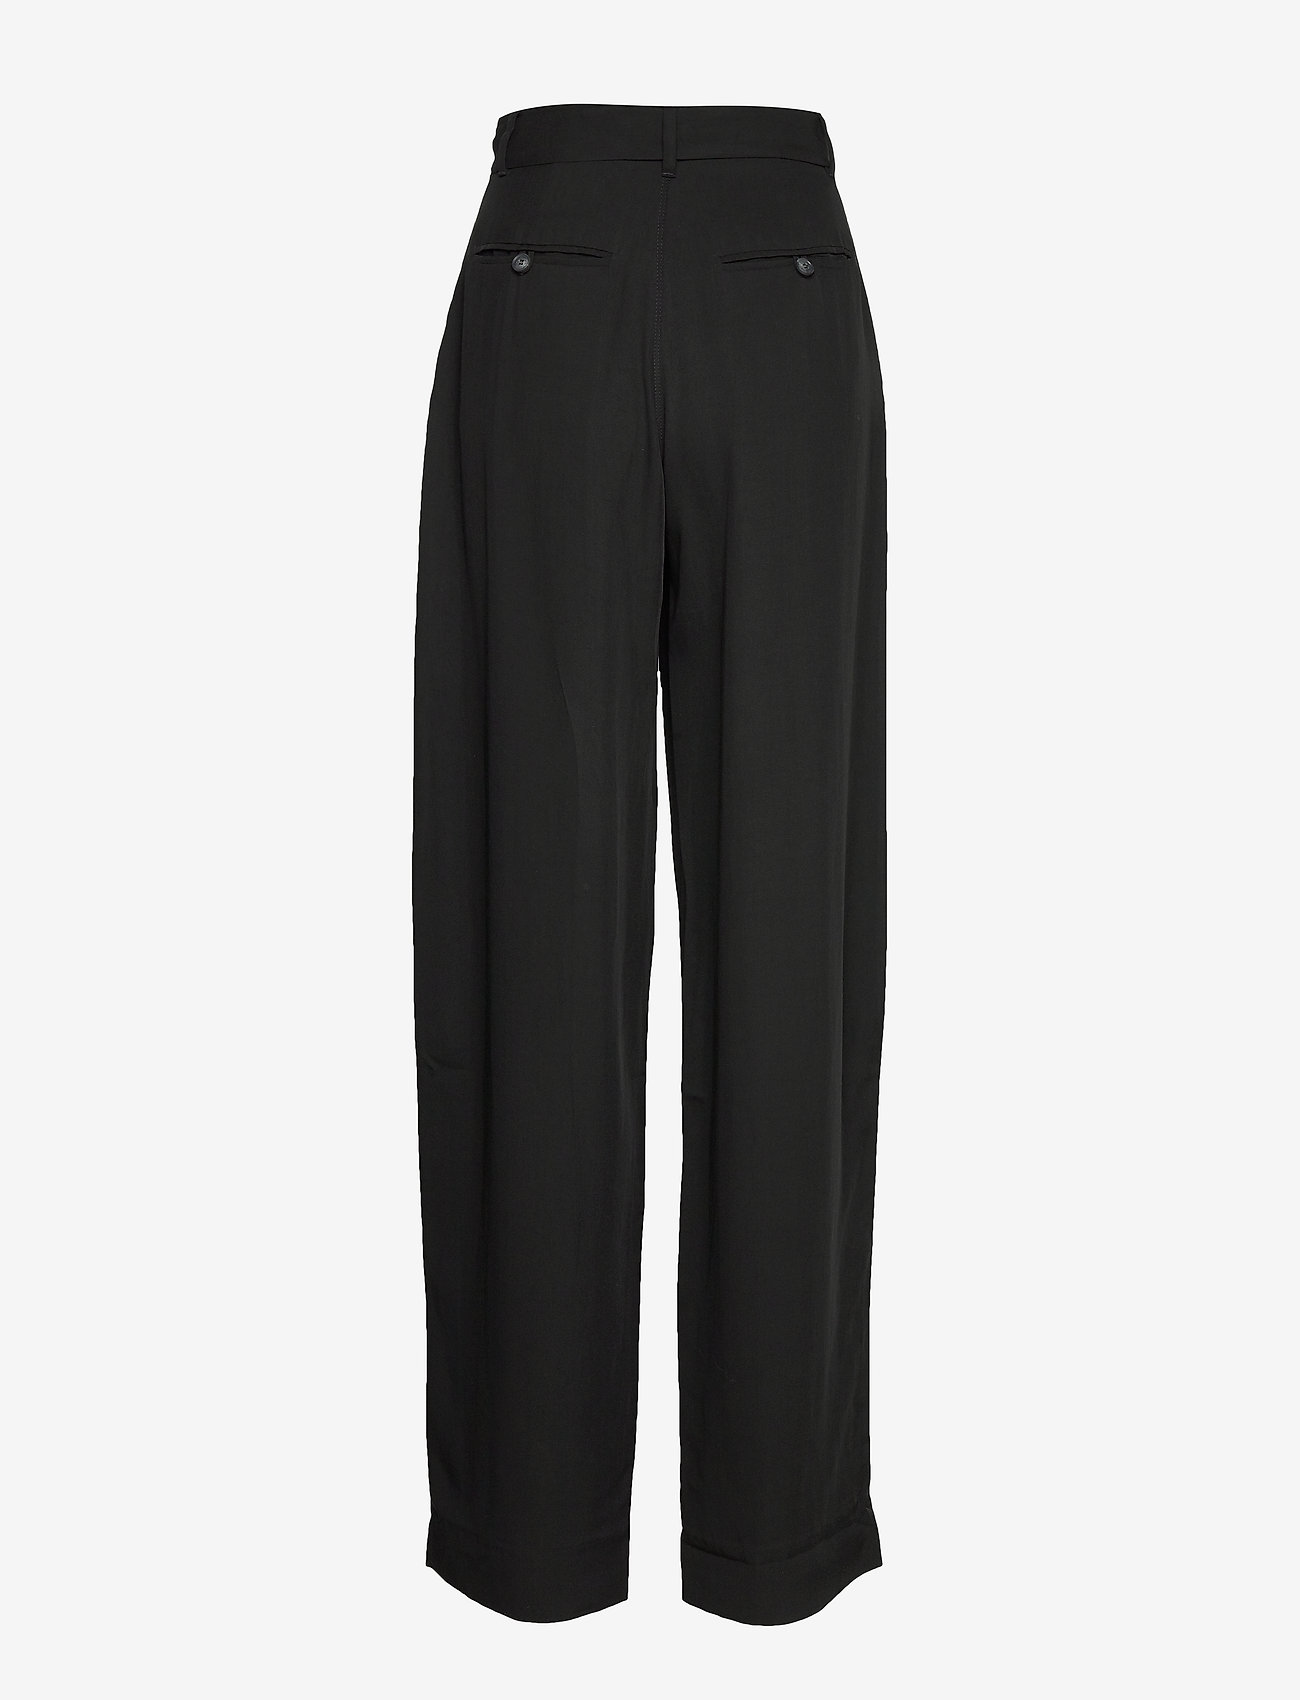 Whyred - MAXTON BELT - wide leg trousers - black - 1